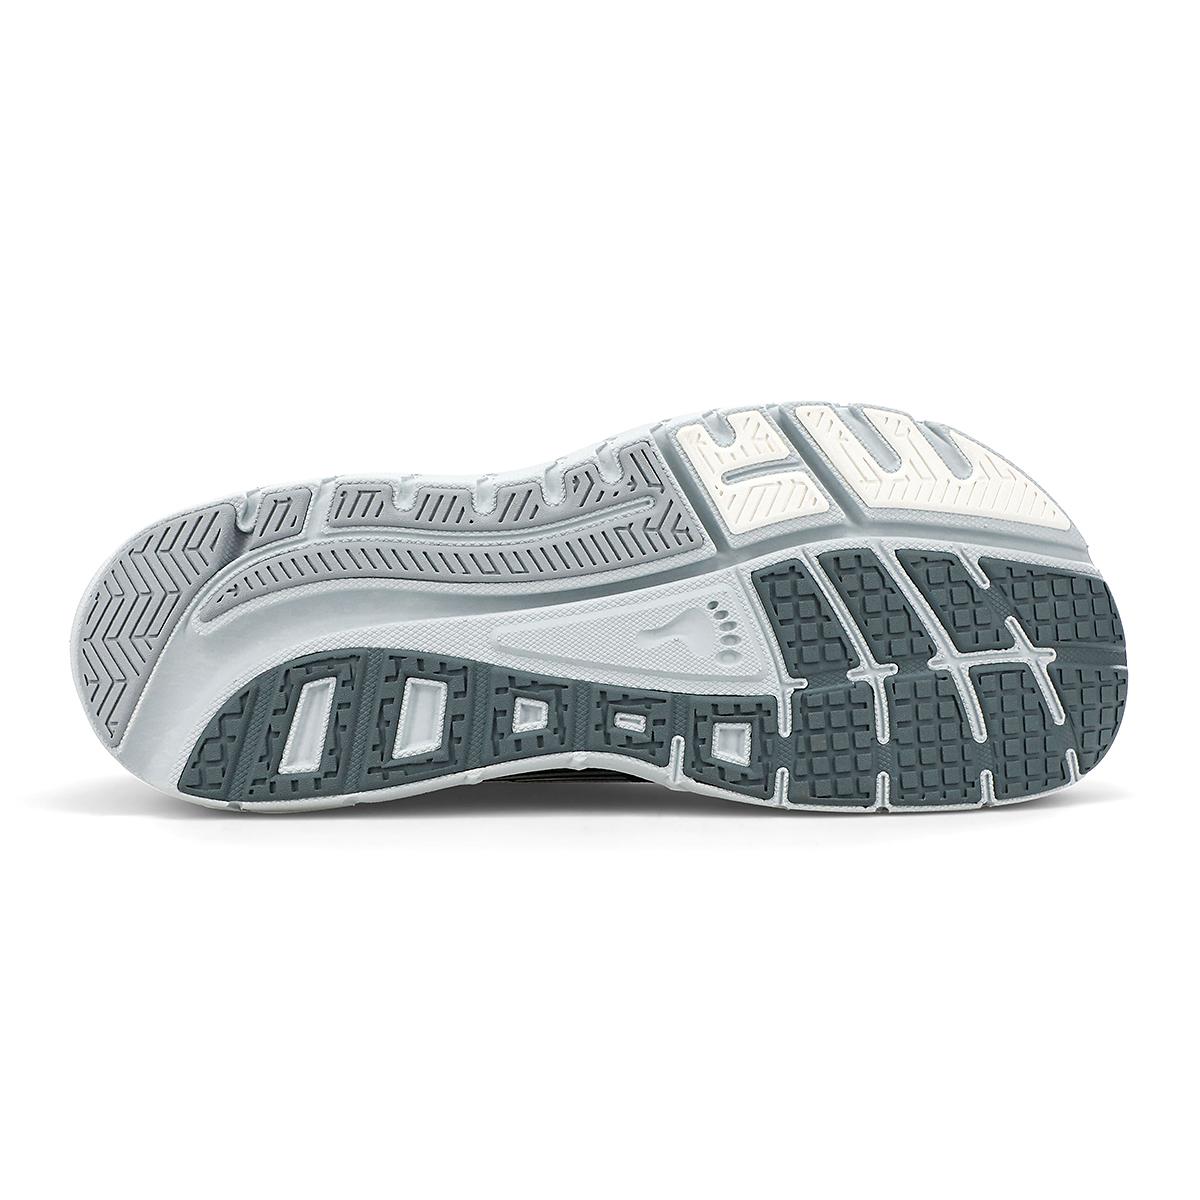 Men's Altra Provision 5 Running Shoe - Color: Black/Gray - Size: 8 - Width: Regular, Black/Gray, large, image 4